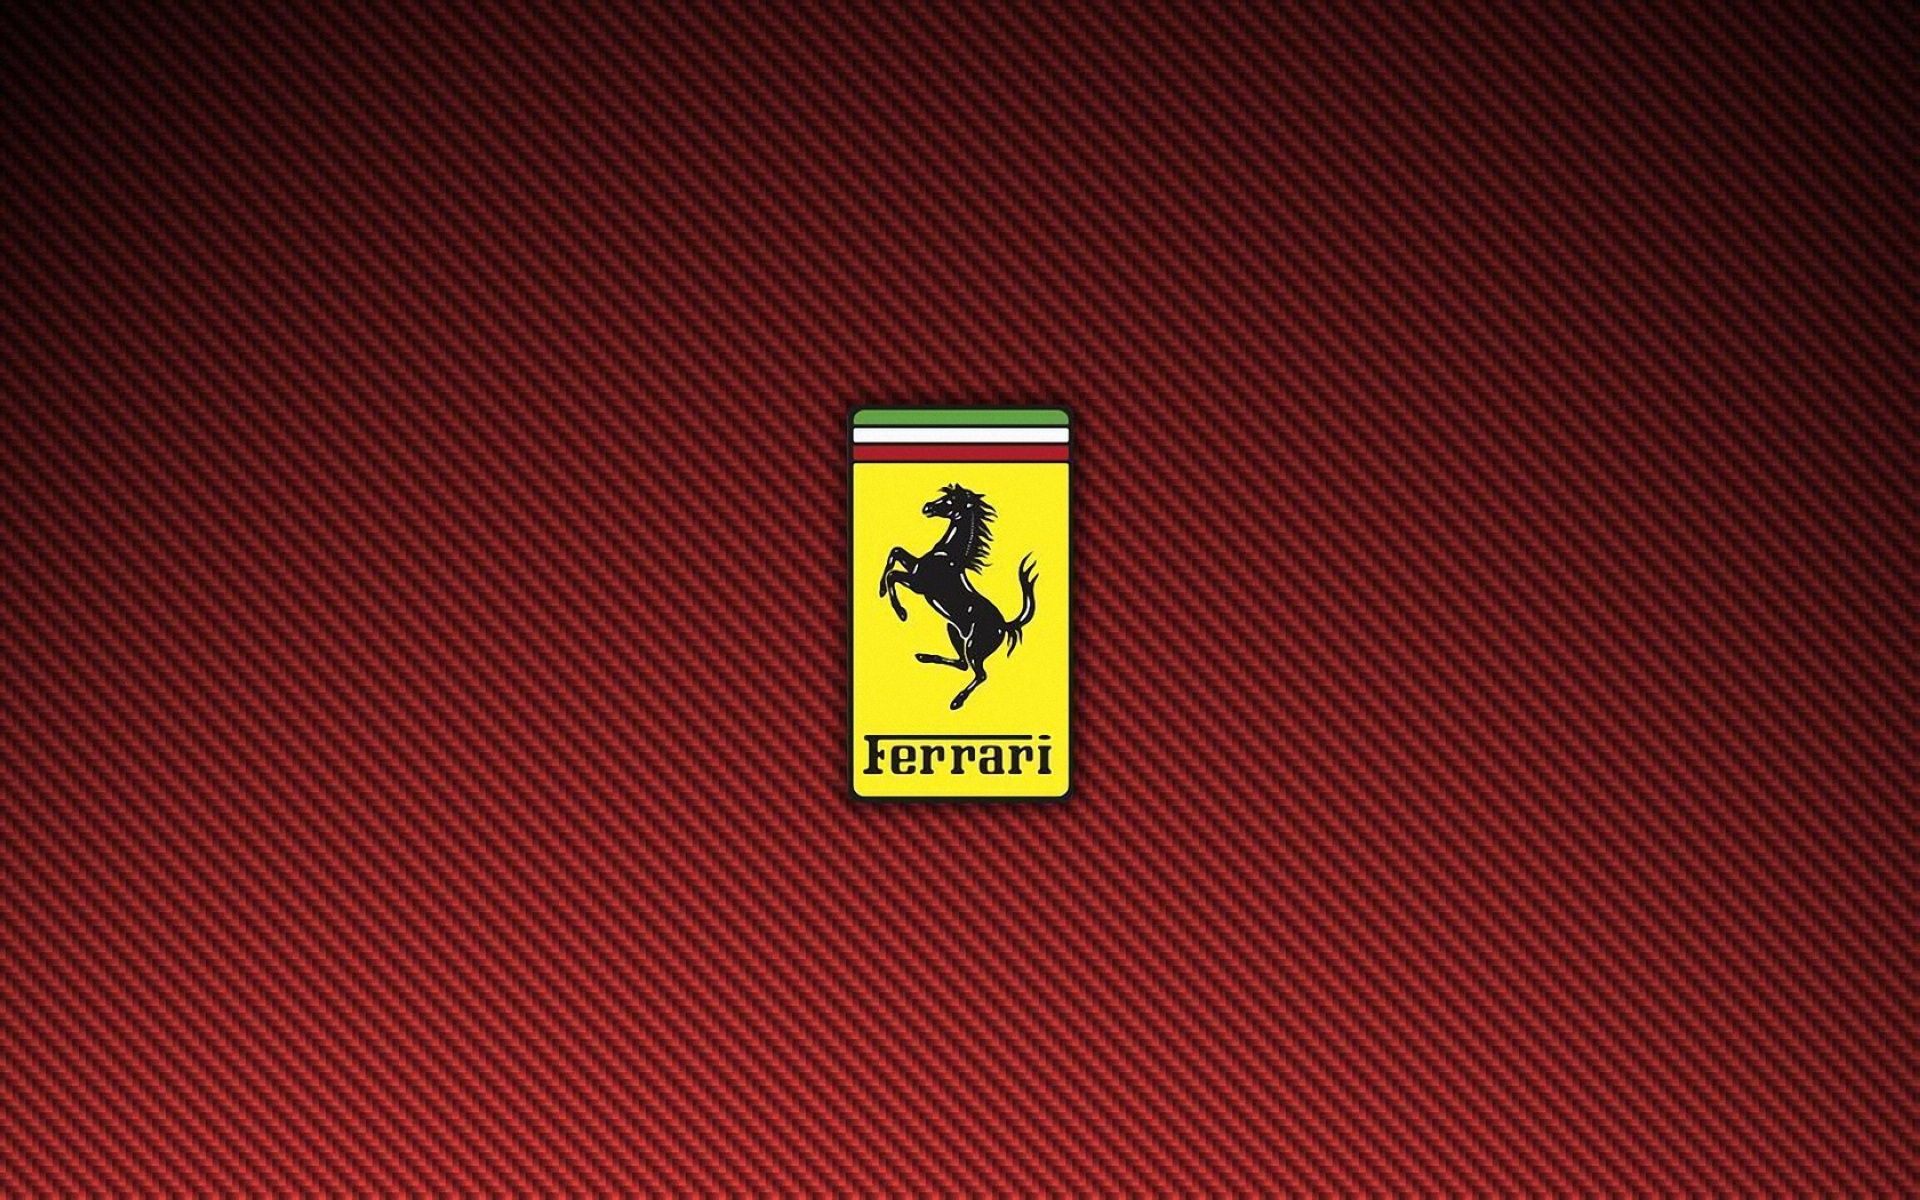 ... Ferrari Logo Wallpaper 07 ...